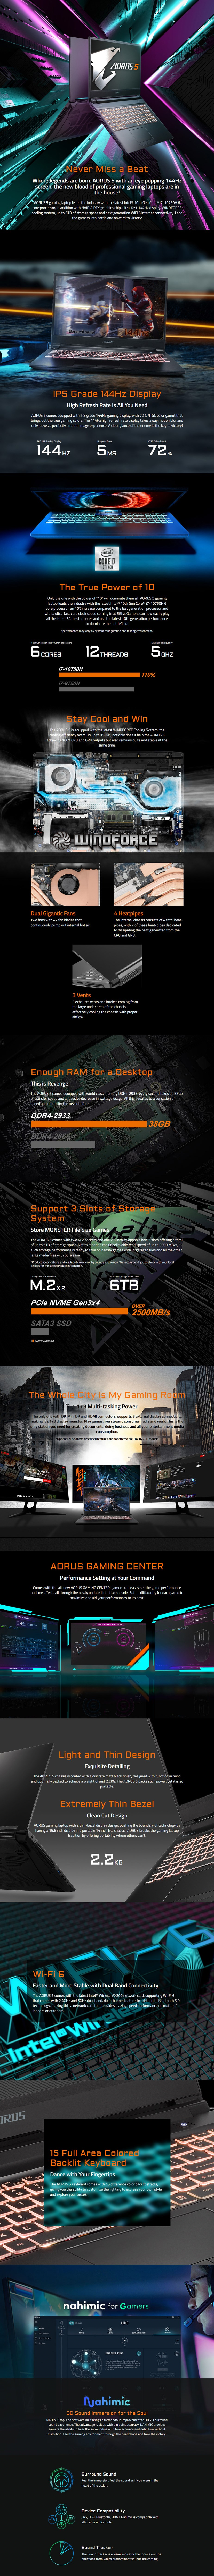 gigabyte-aorus-5-156-144hz-gaming-laptop-i710750h-16gb-512gb-gtx-1660-ti-w10h-ac34929-7.jpg